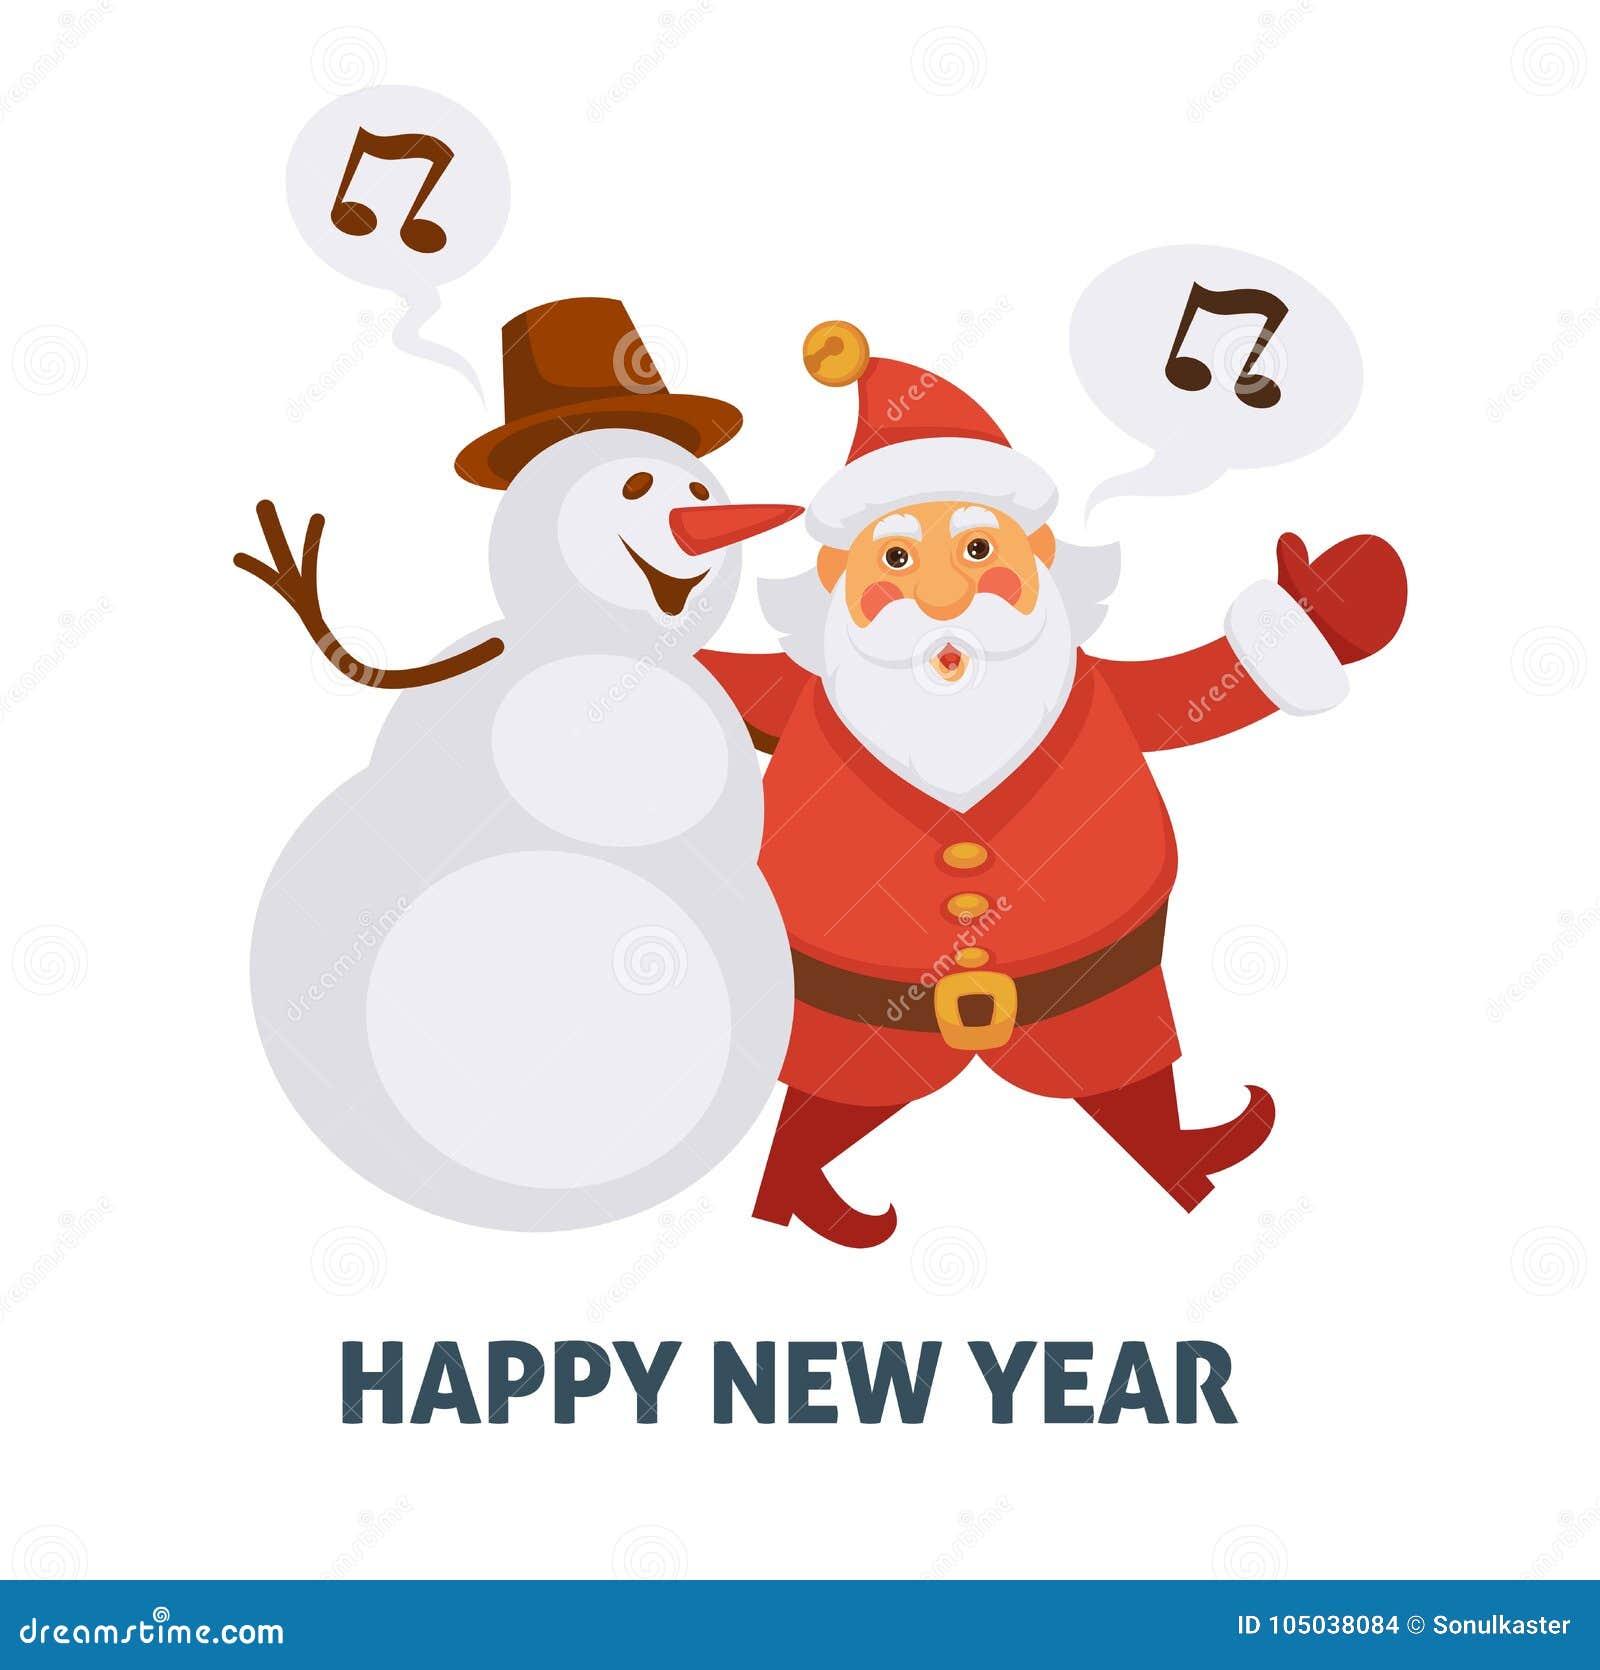 Happy new year cartoon santa and snowman singing christmas song download happy new year cartoon santa and snowman singing christmas song vector greeting card icon stock m4hsunfo